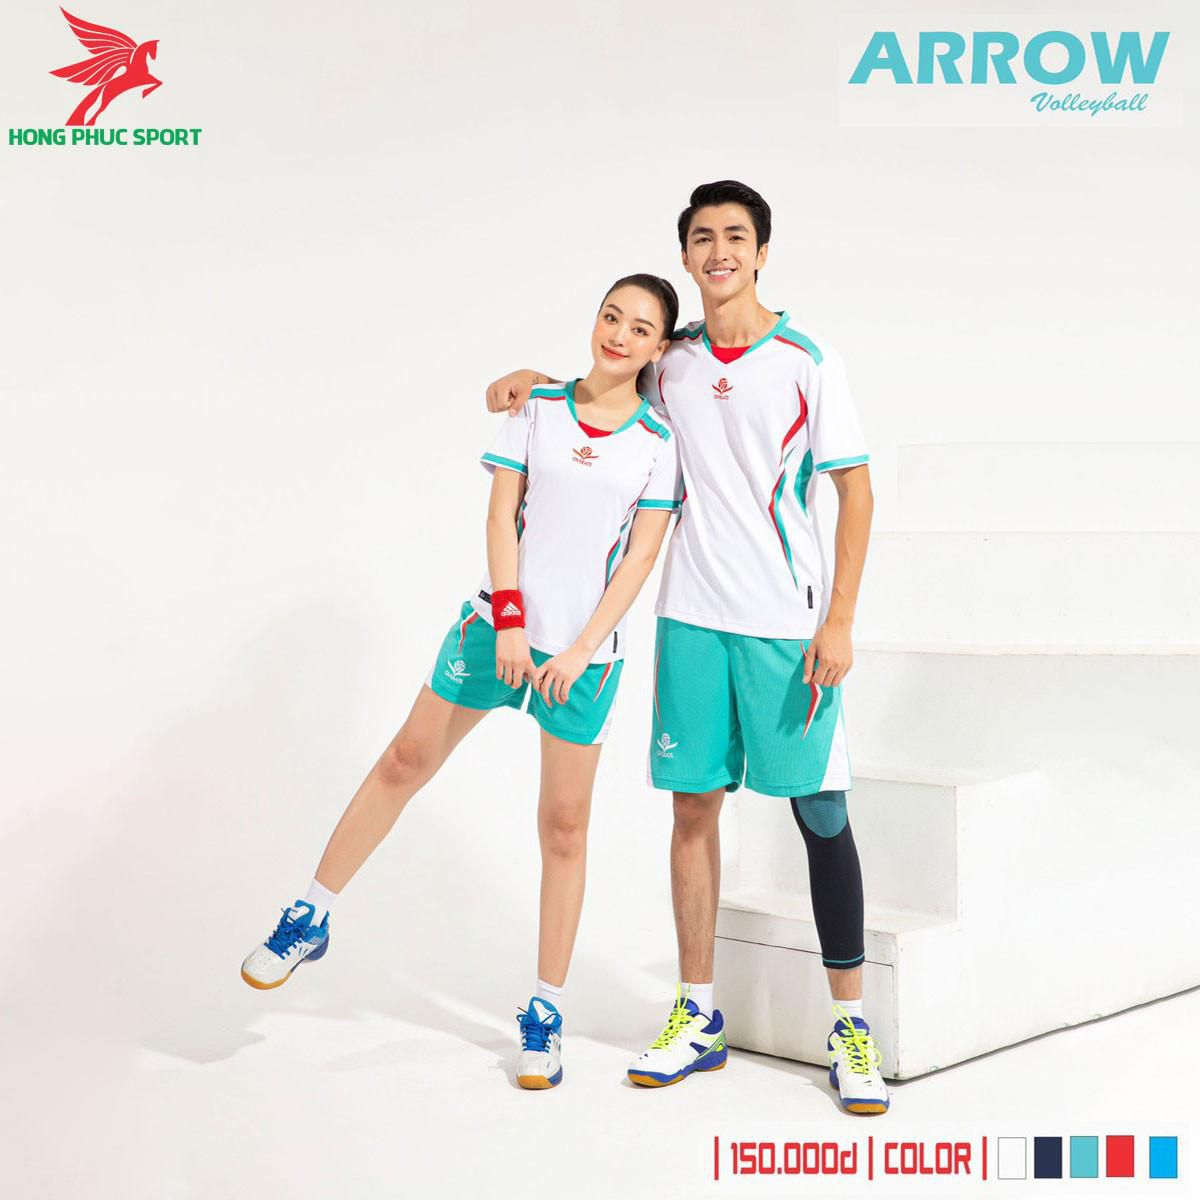 https://cdn.hongphucsport.com/unsafe/s4.shopbay.vn/files/285/ao-bong-chuyen-overate-arrow-mau-trang-1-6051740c89566.jpg